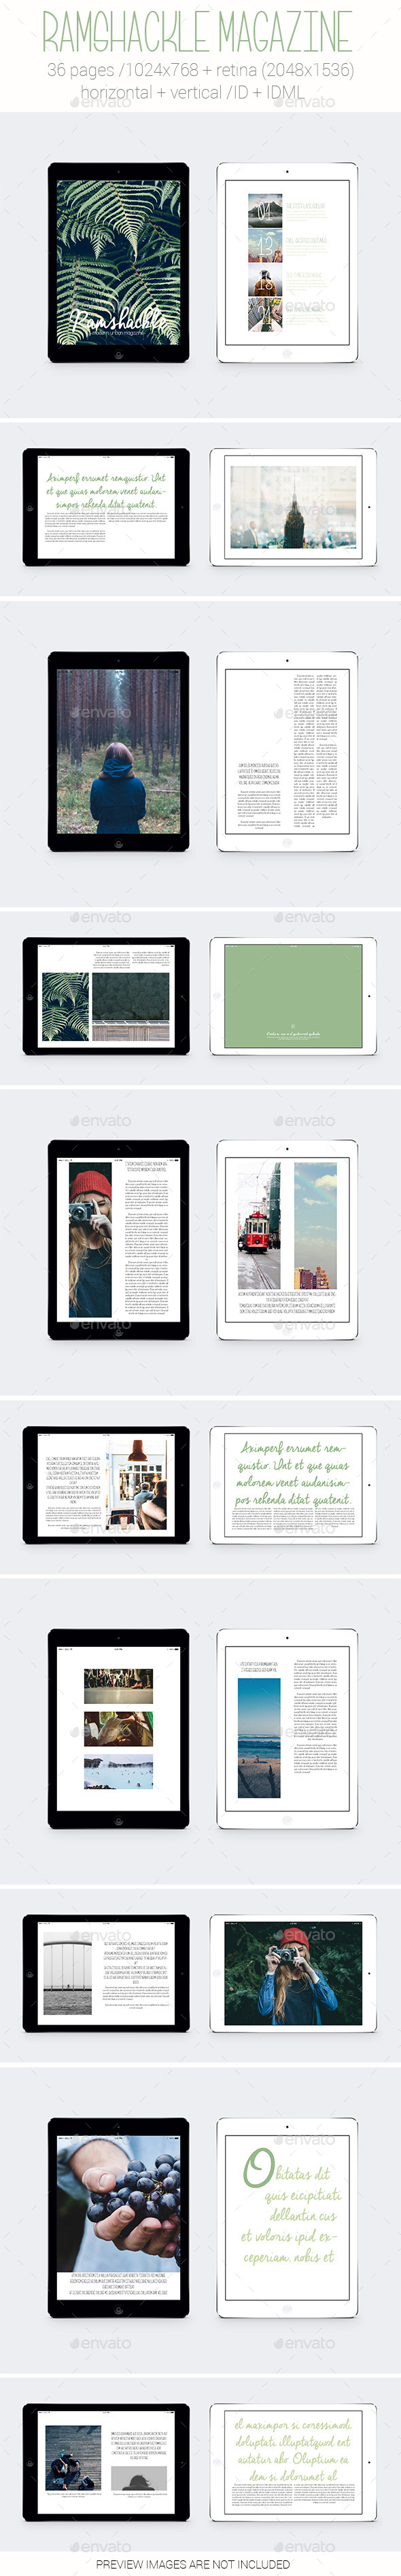 Tablet&iPad Ramshackle Magazine - Digital Magazines ePublishing